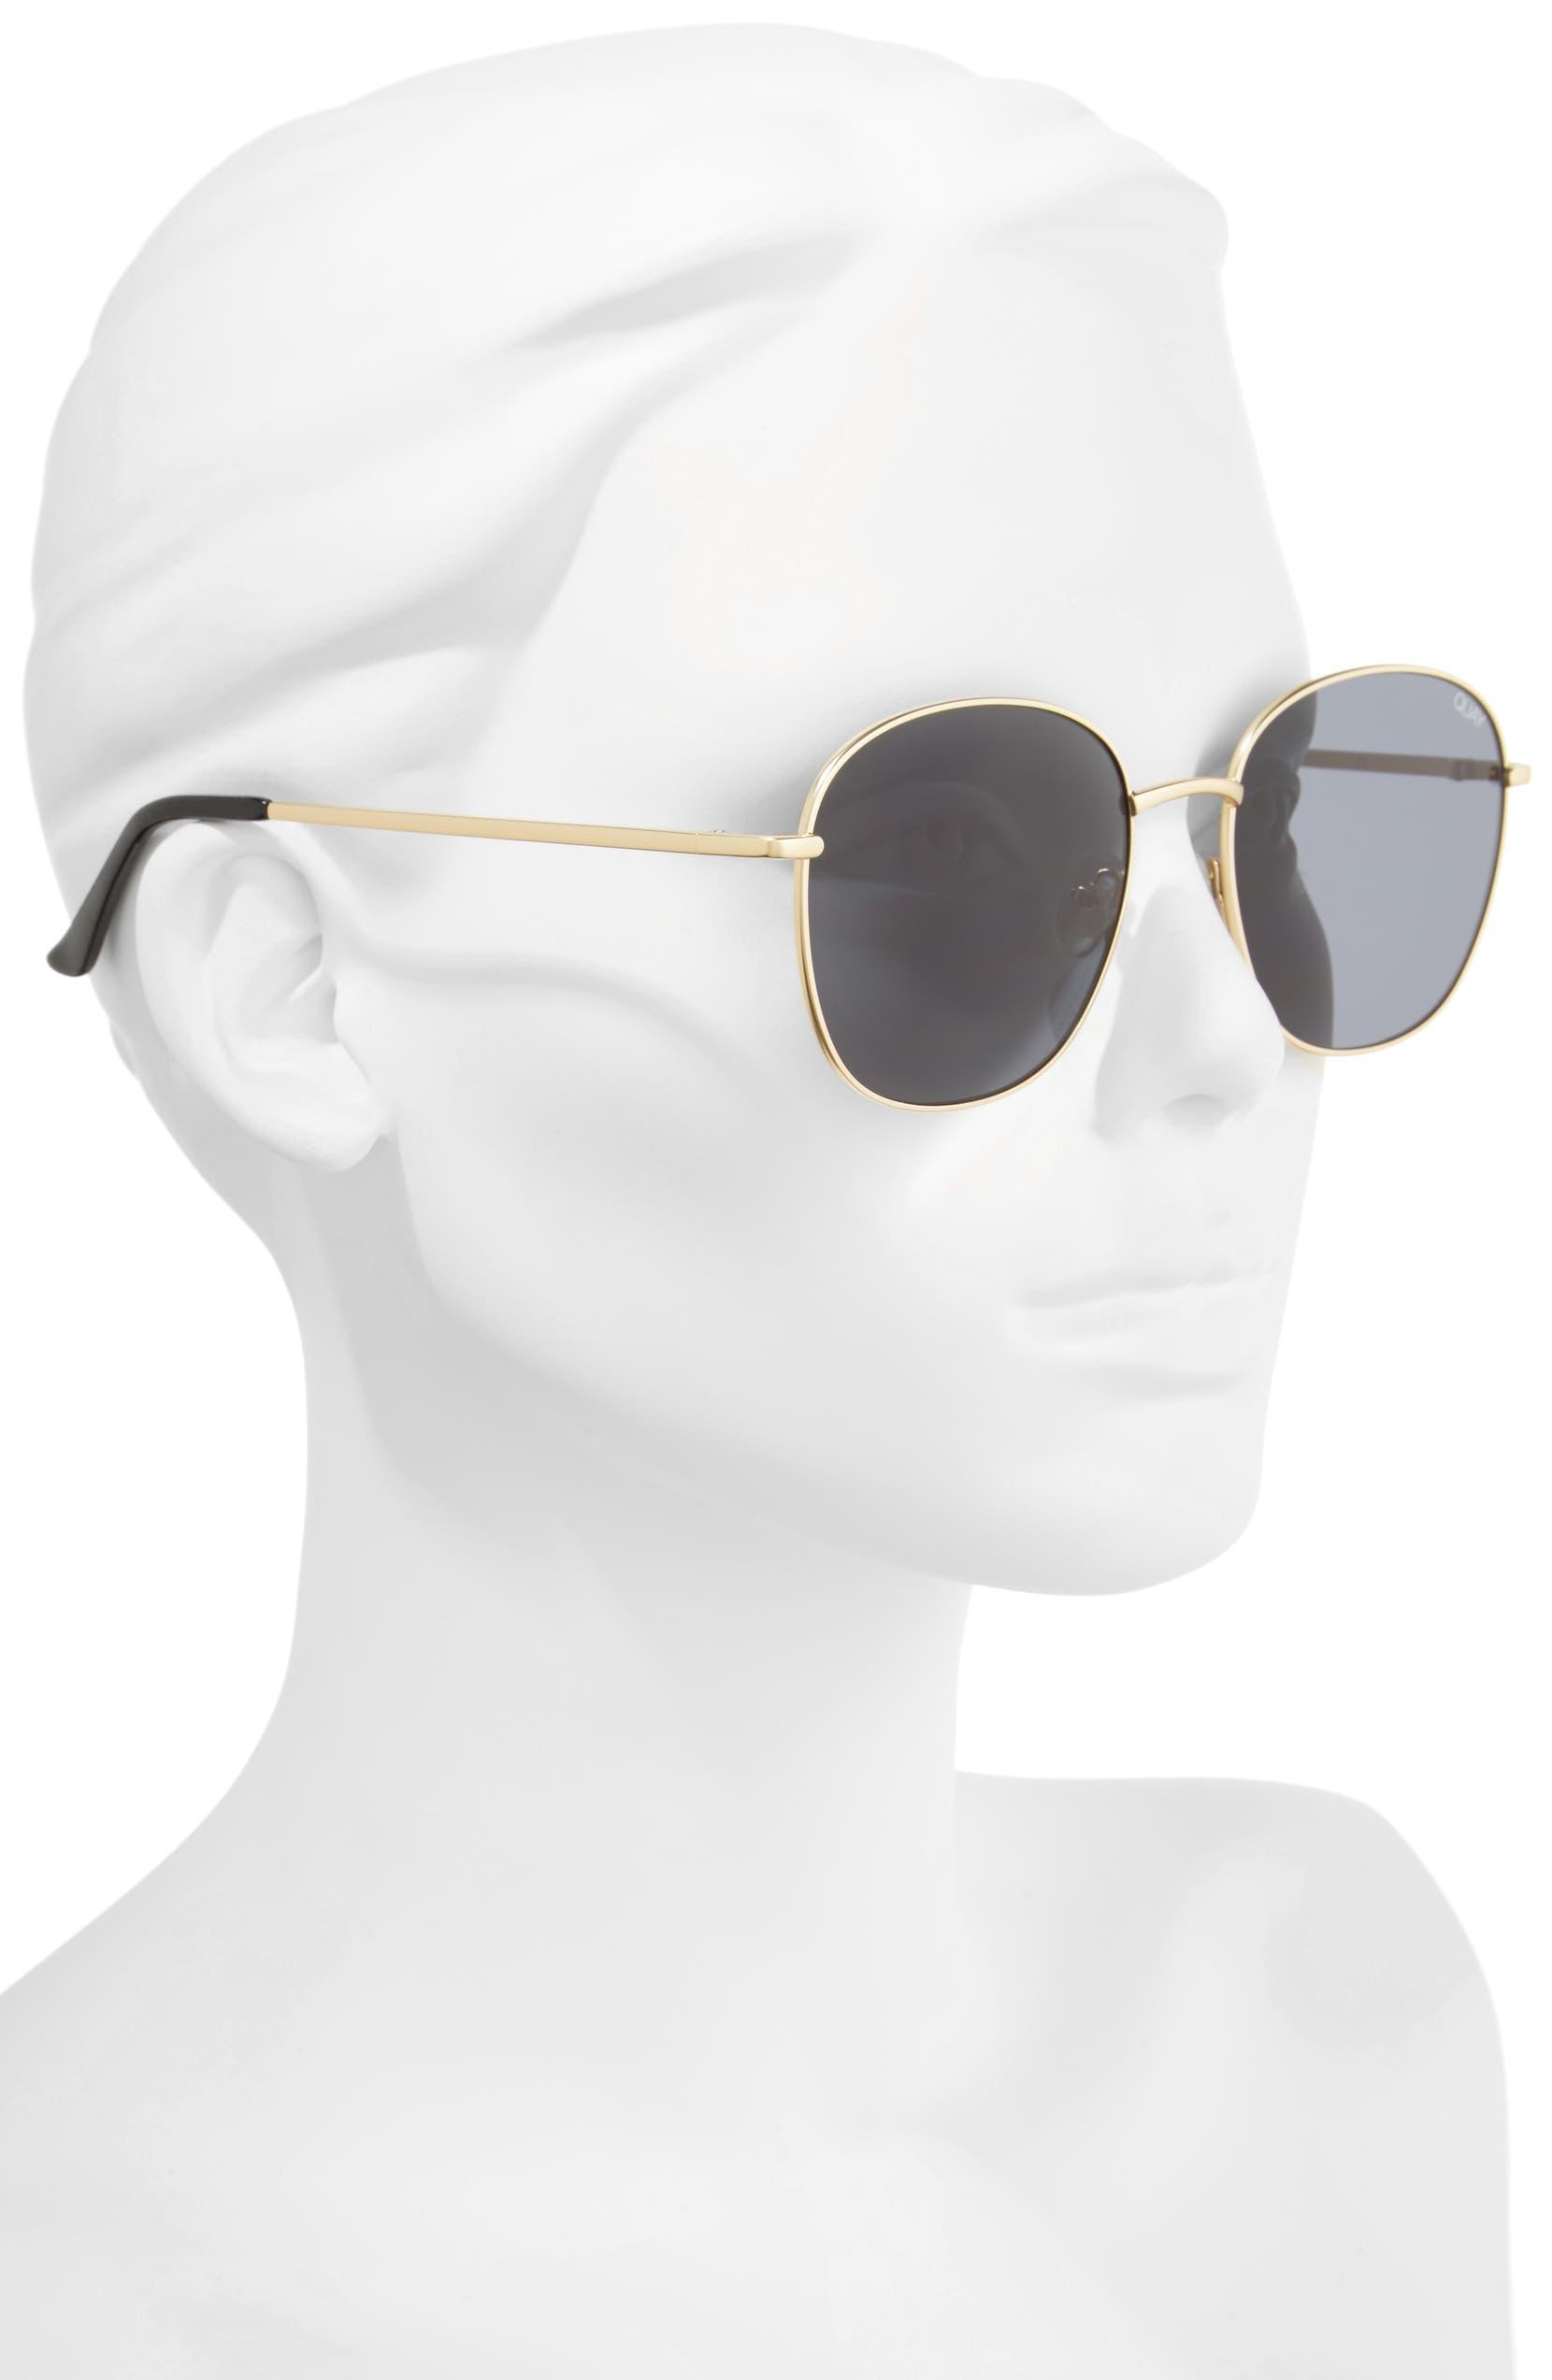 48d2af9799 Quay Australia Jezabell 57mm Round Sunglasses